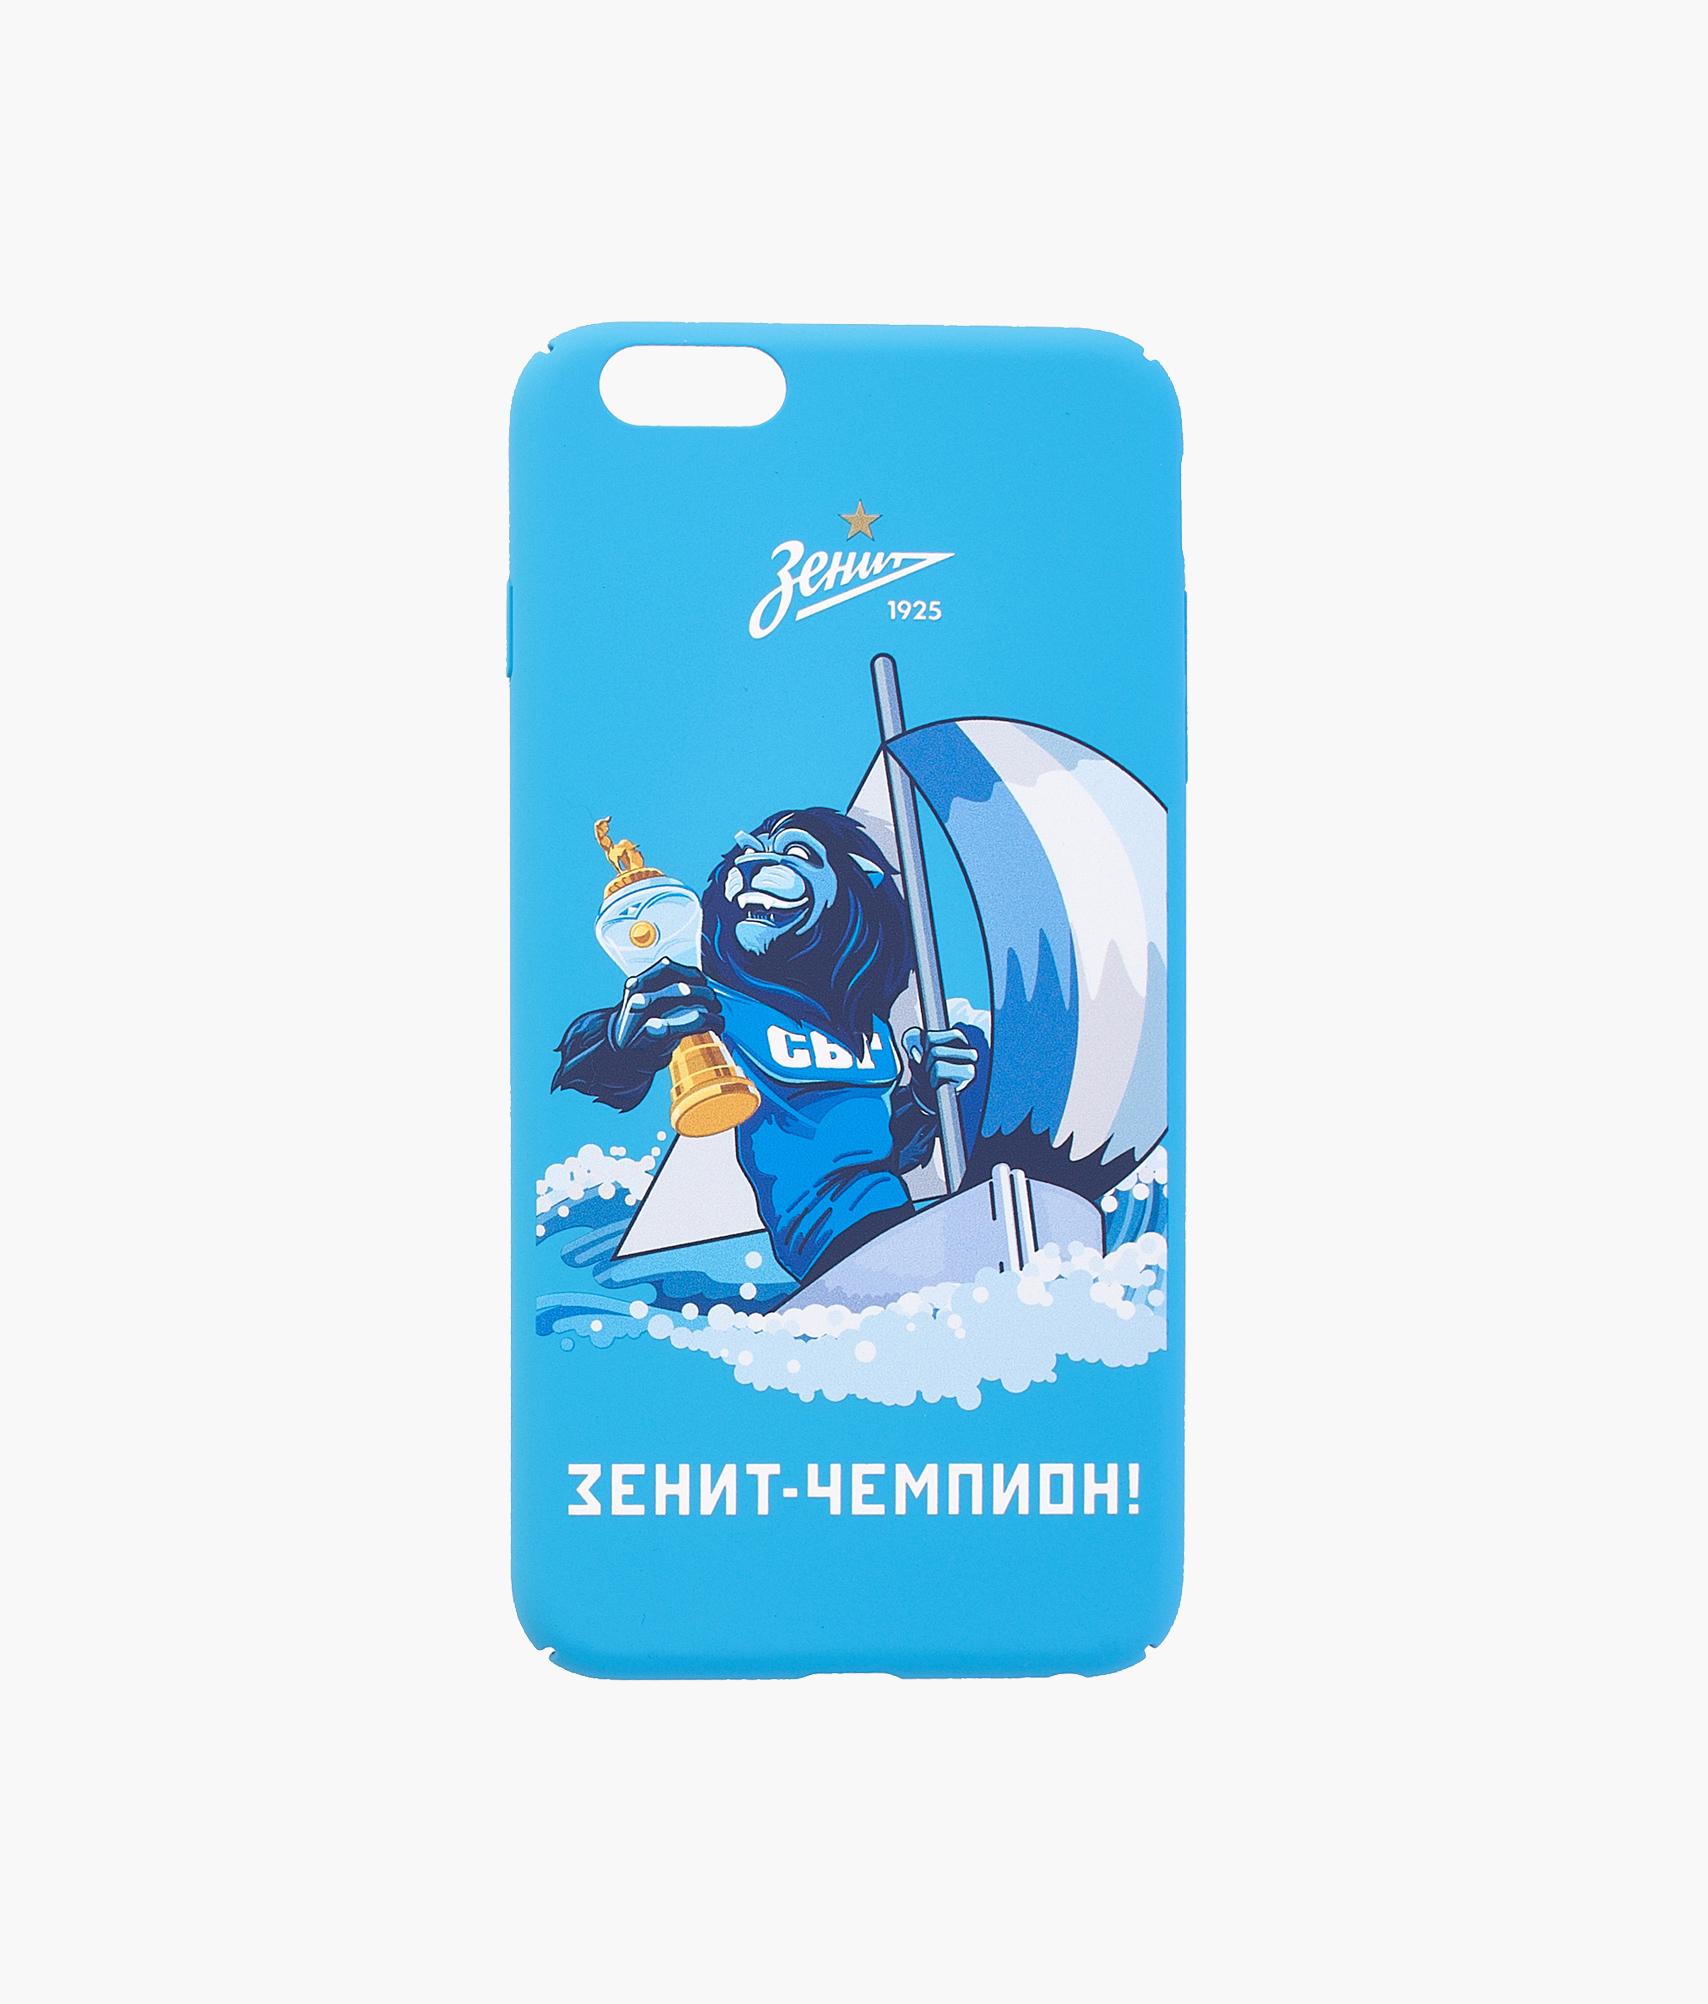 Фото - Чехол для IPhone 6/6S Plus «Лев» 2018/19 Зенит чехол накладка для apple iphone 6 6s deppa gel plus case 85213 pink клип кейс полиуретан